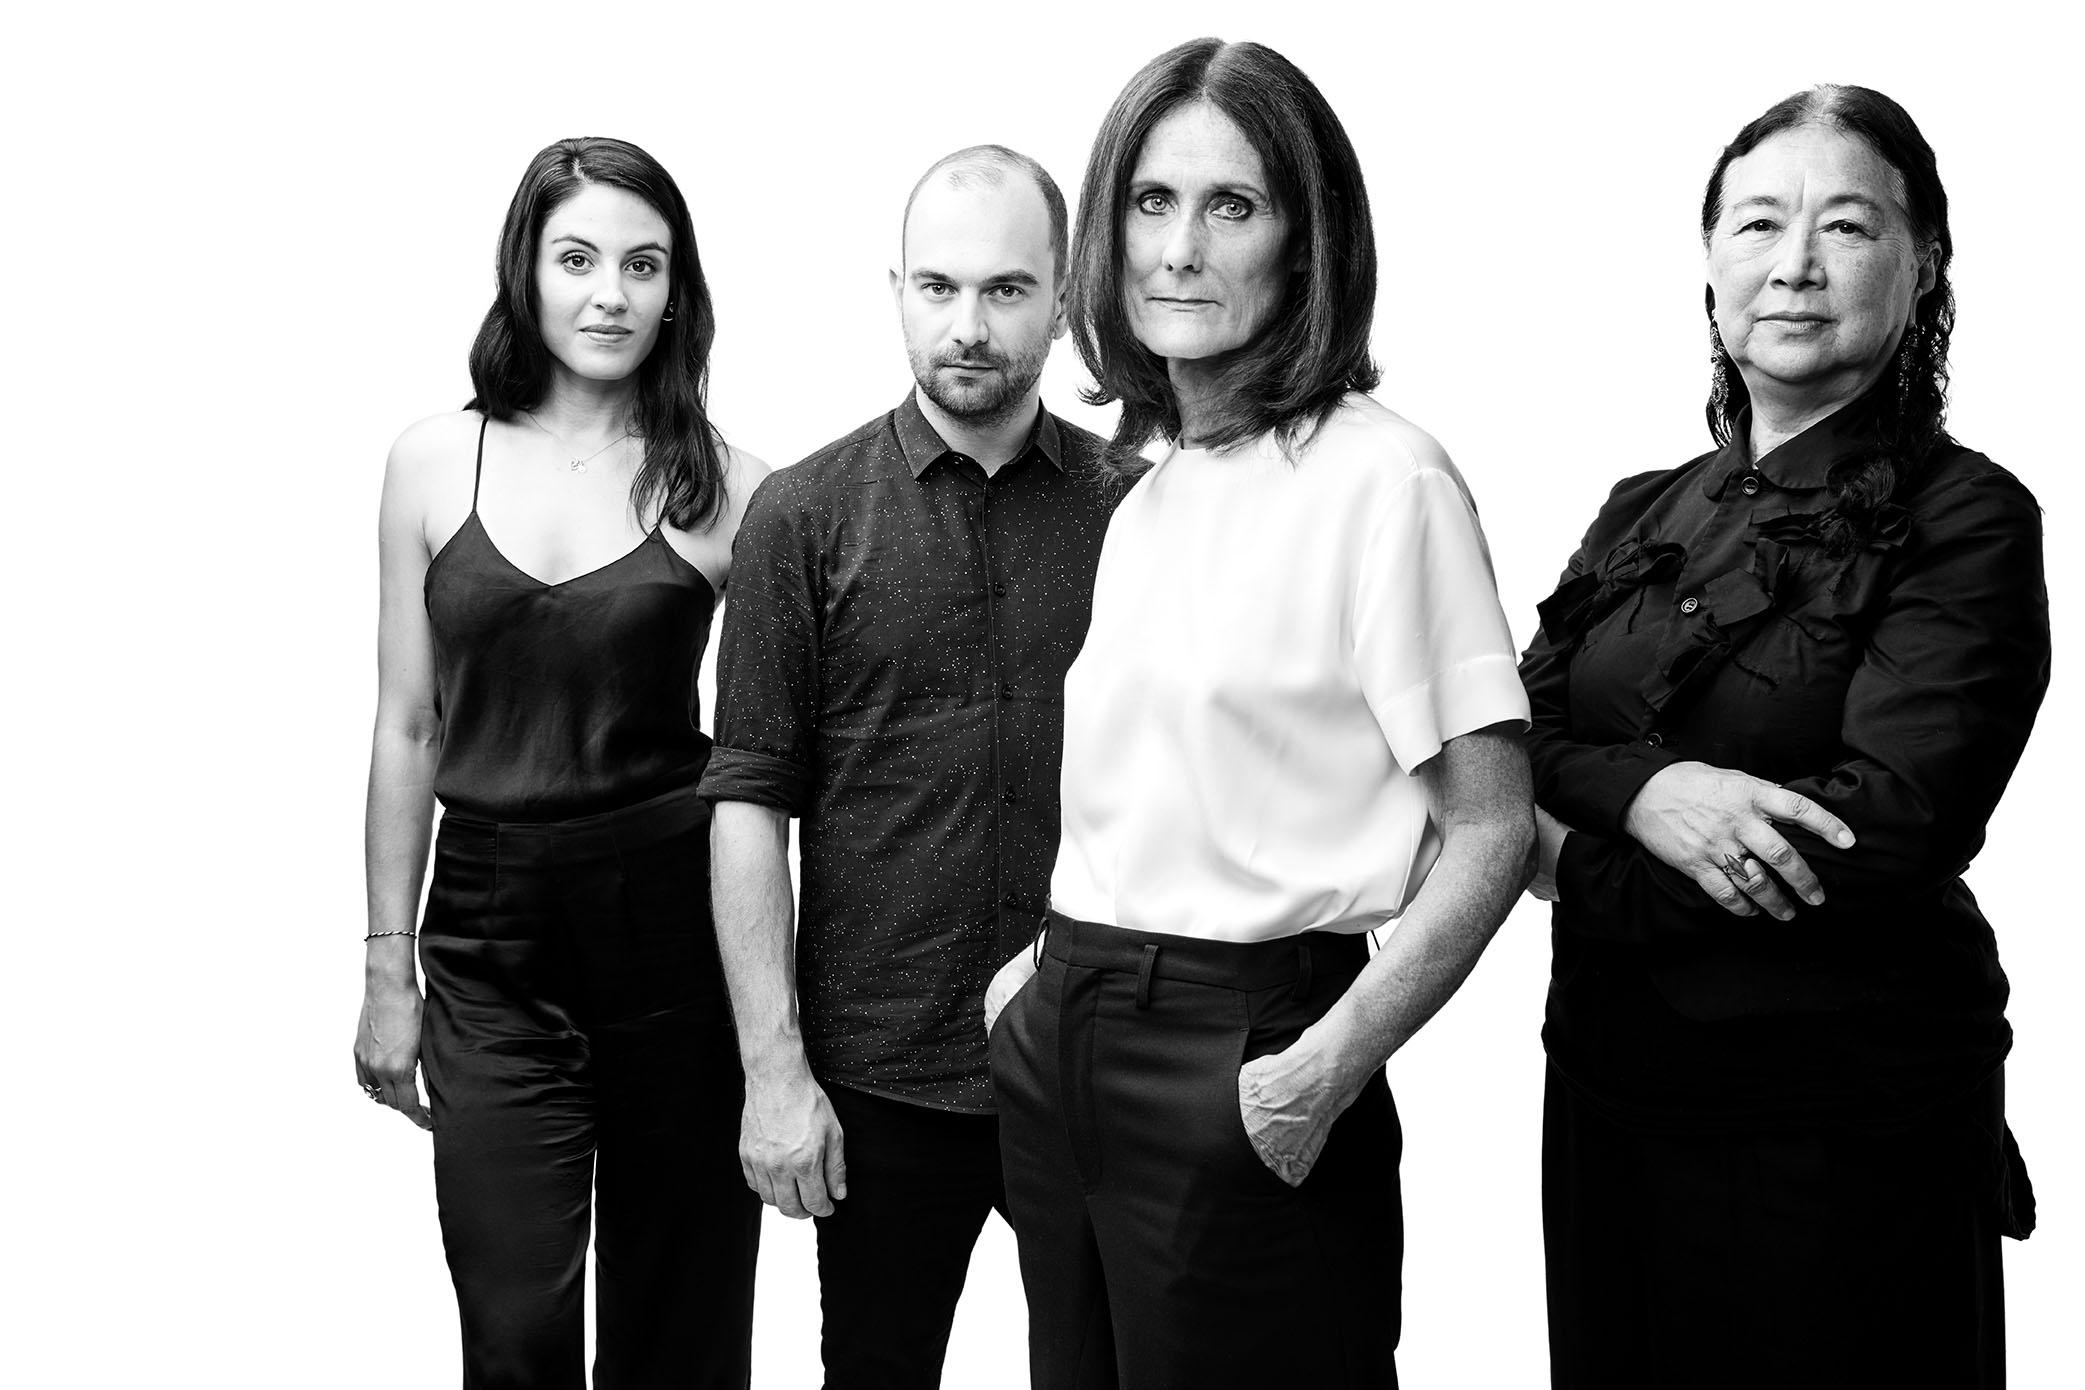 Alexandra Avalone, Dominic Kaffka, Julie Mannion, Nian Fish